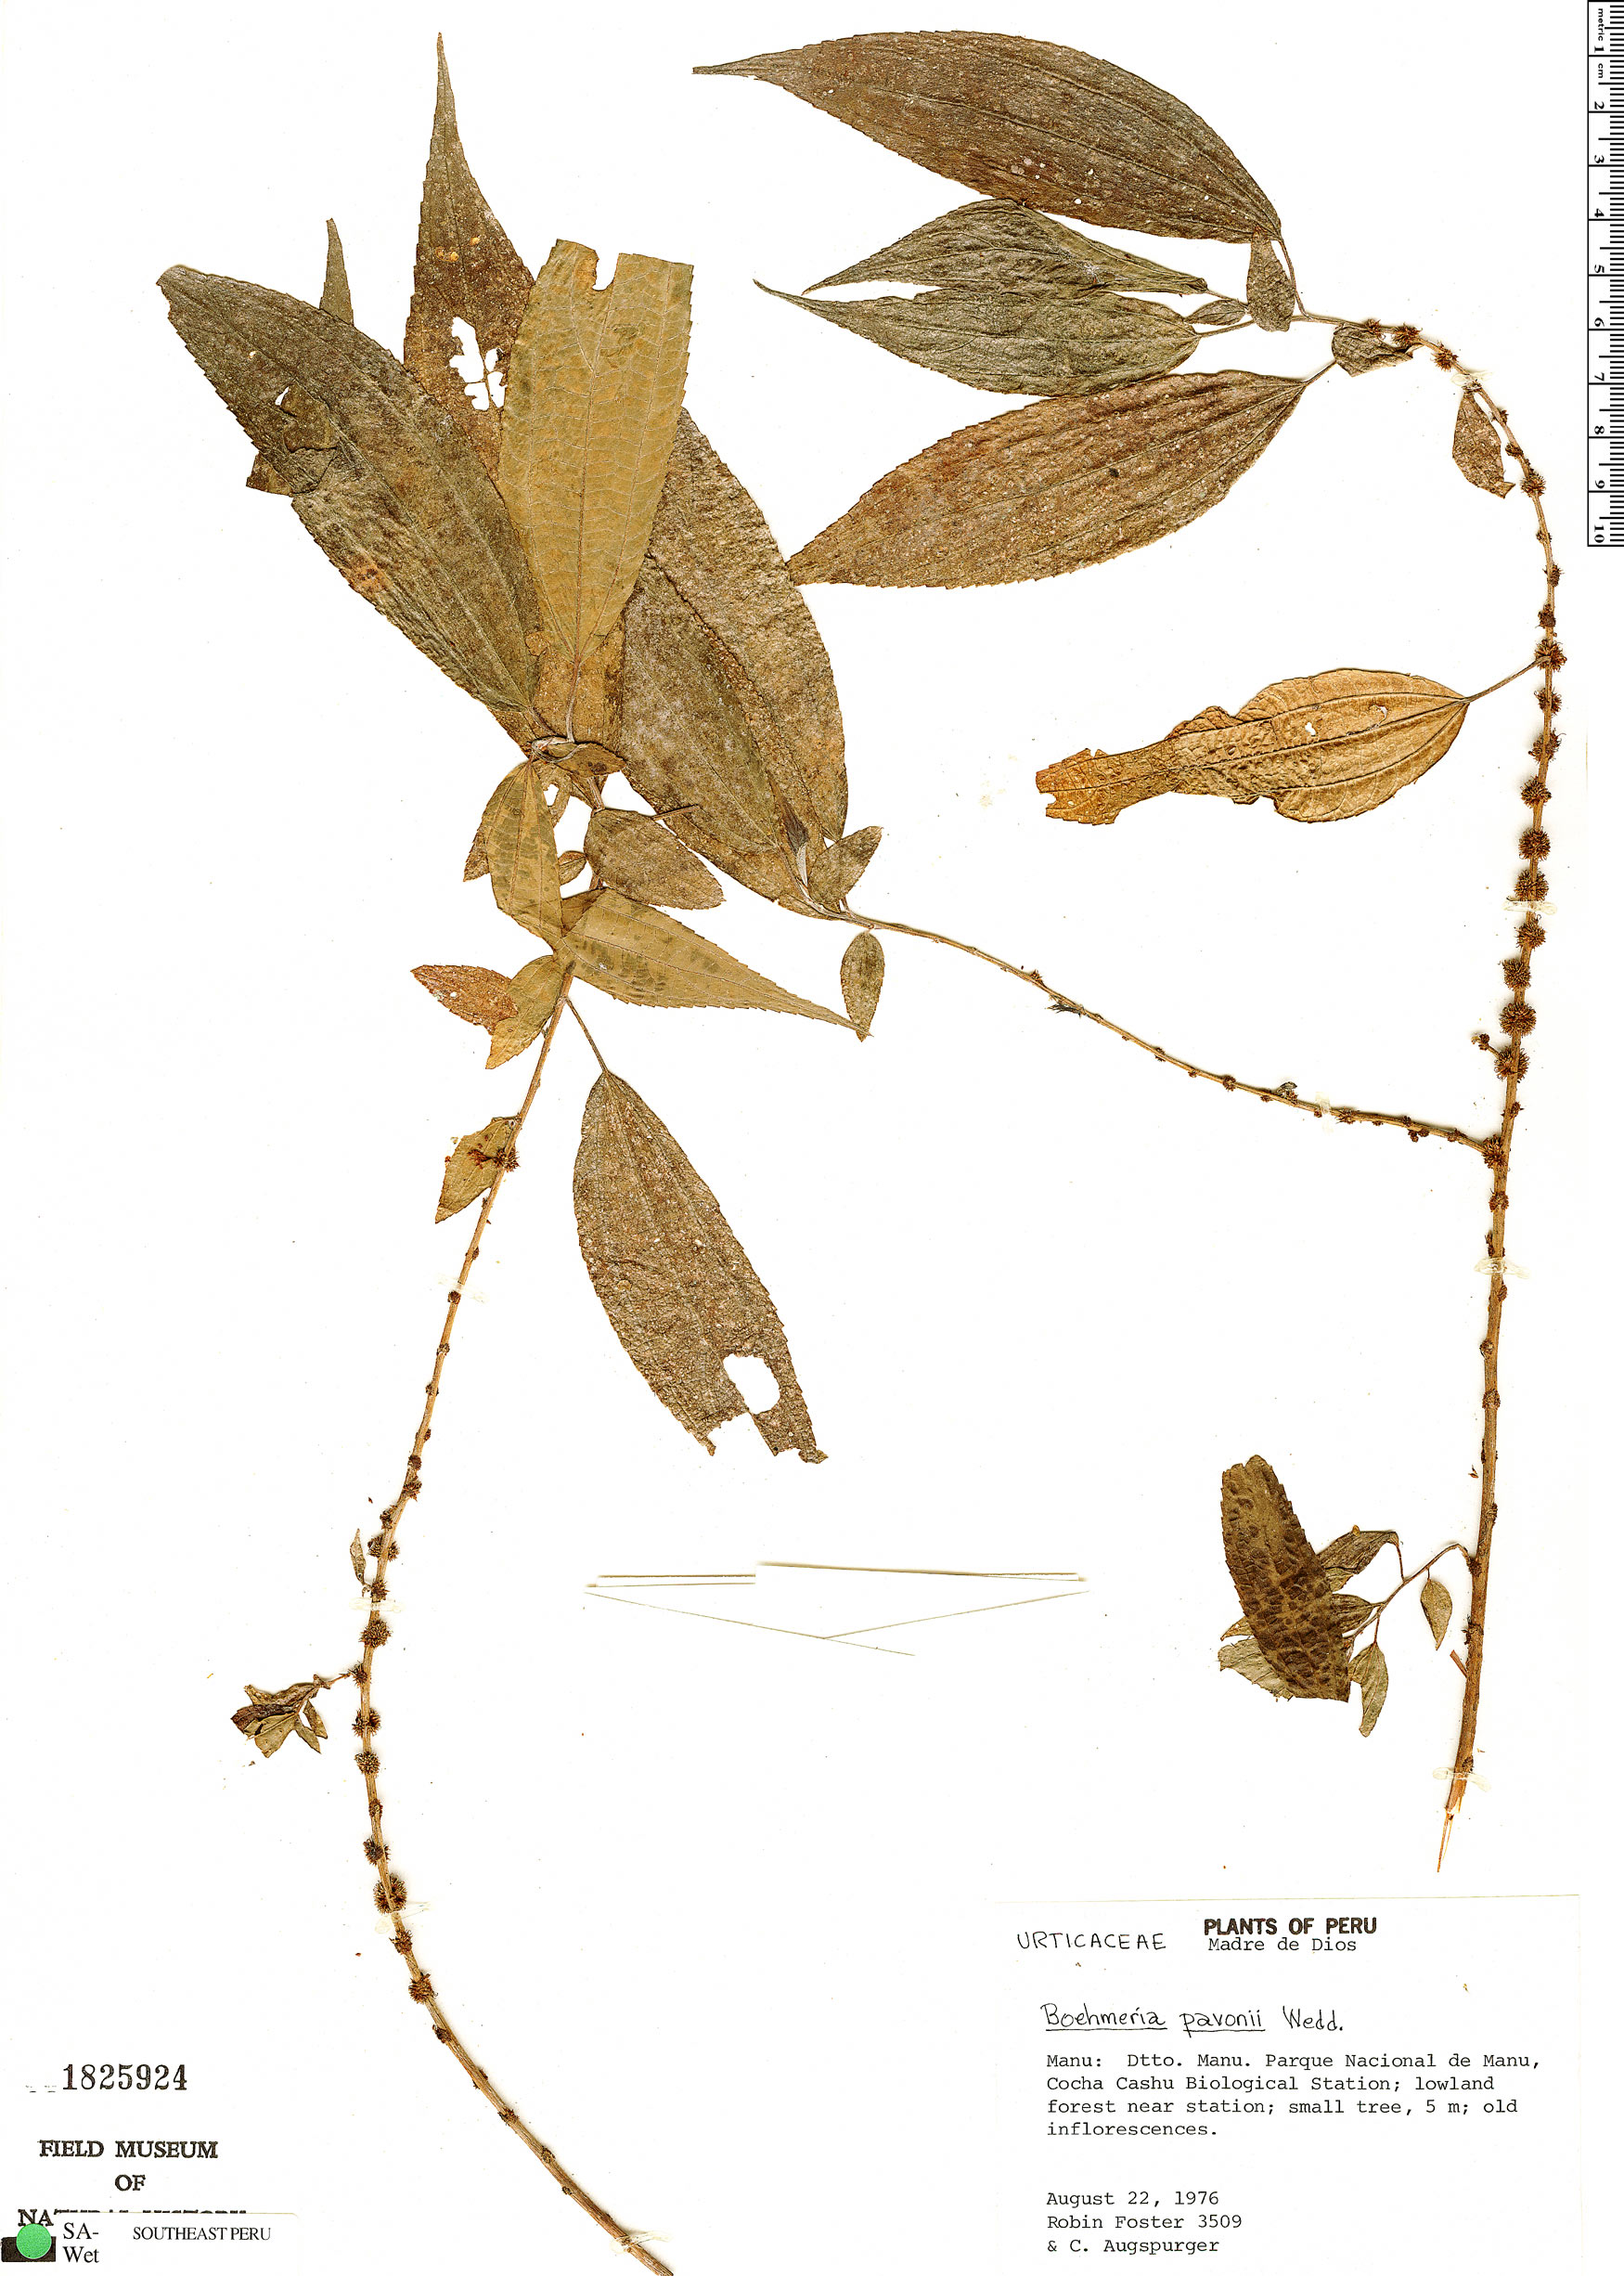 Espécime: Boehmeria pavonii